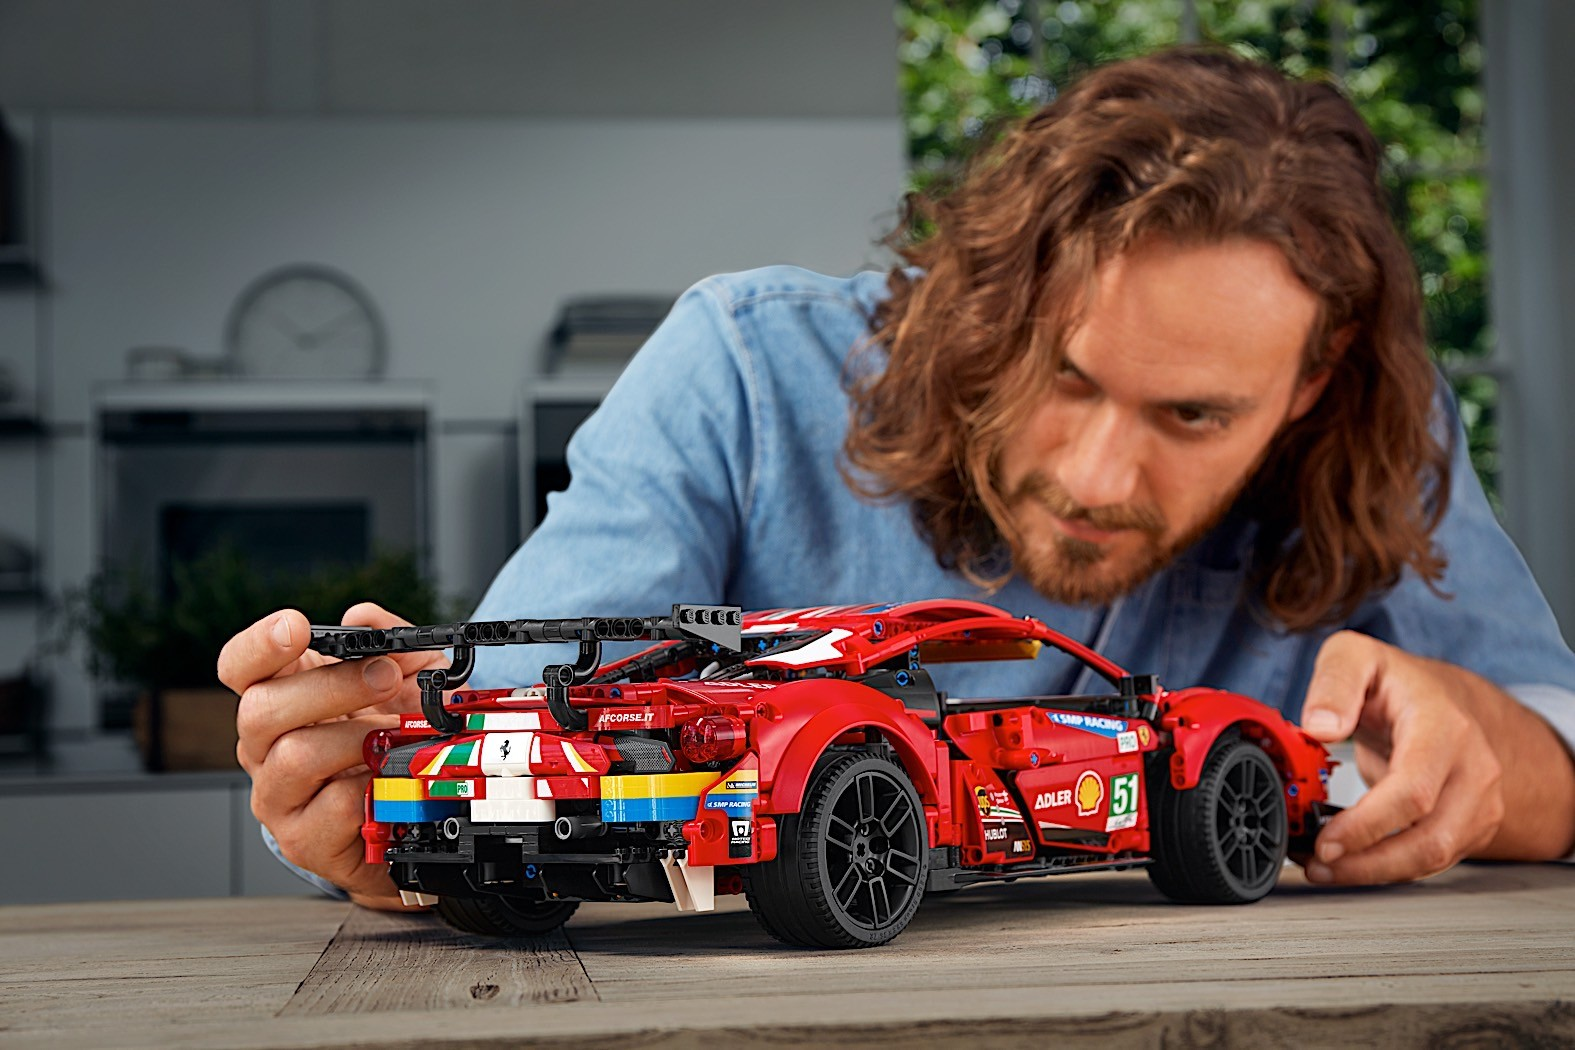 Lego-Technic-Ferrari-488-GTE-AF-Corse-51-9